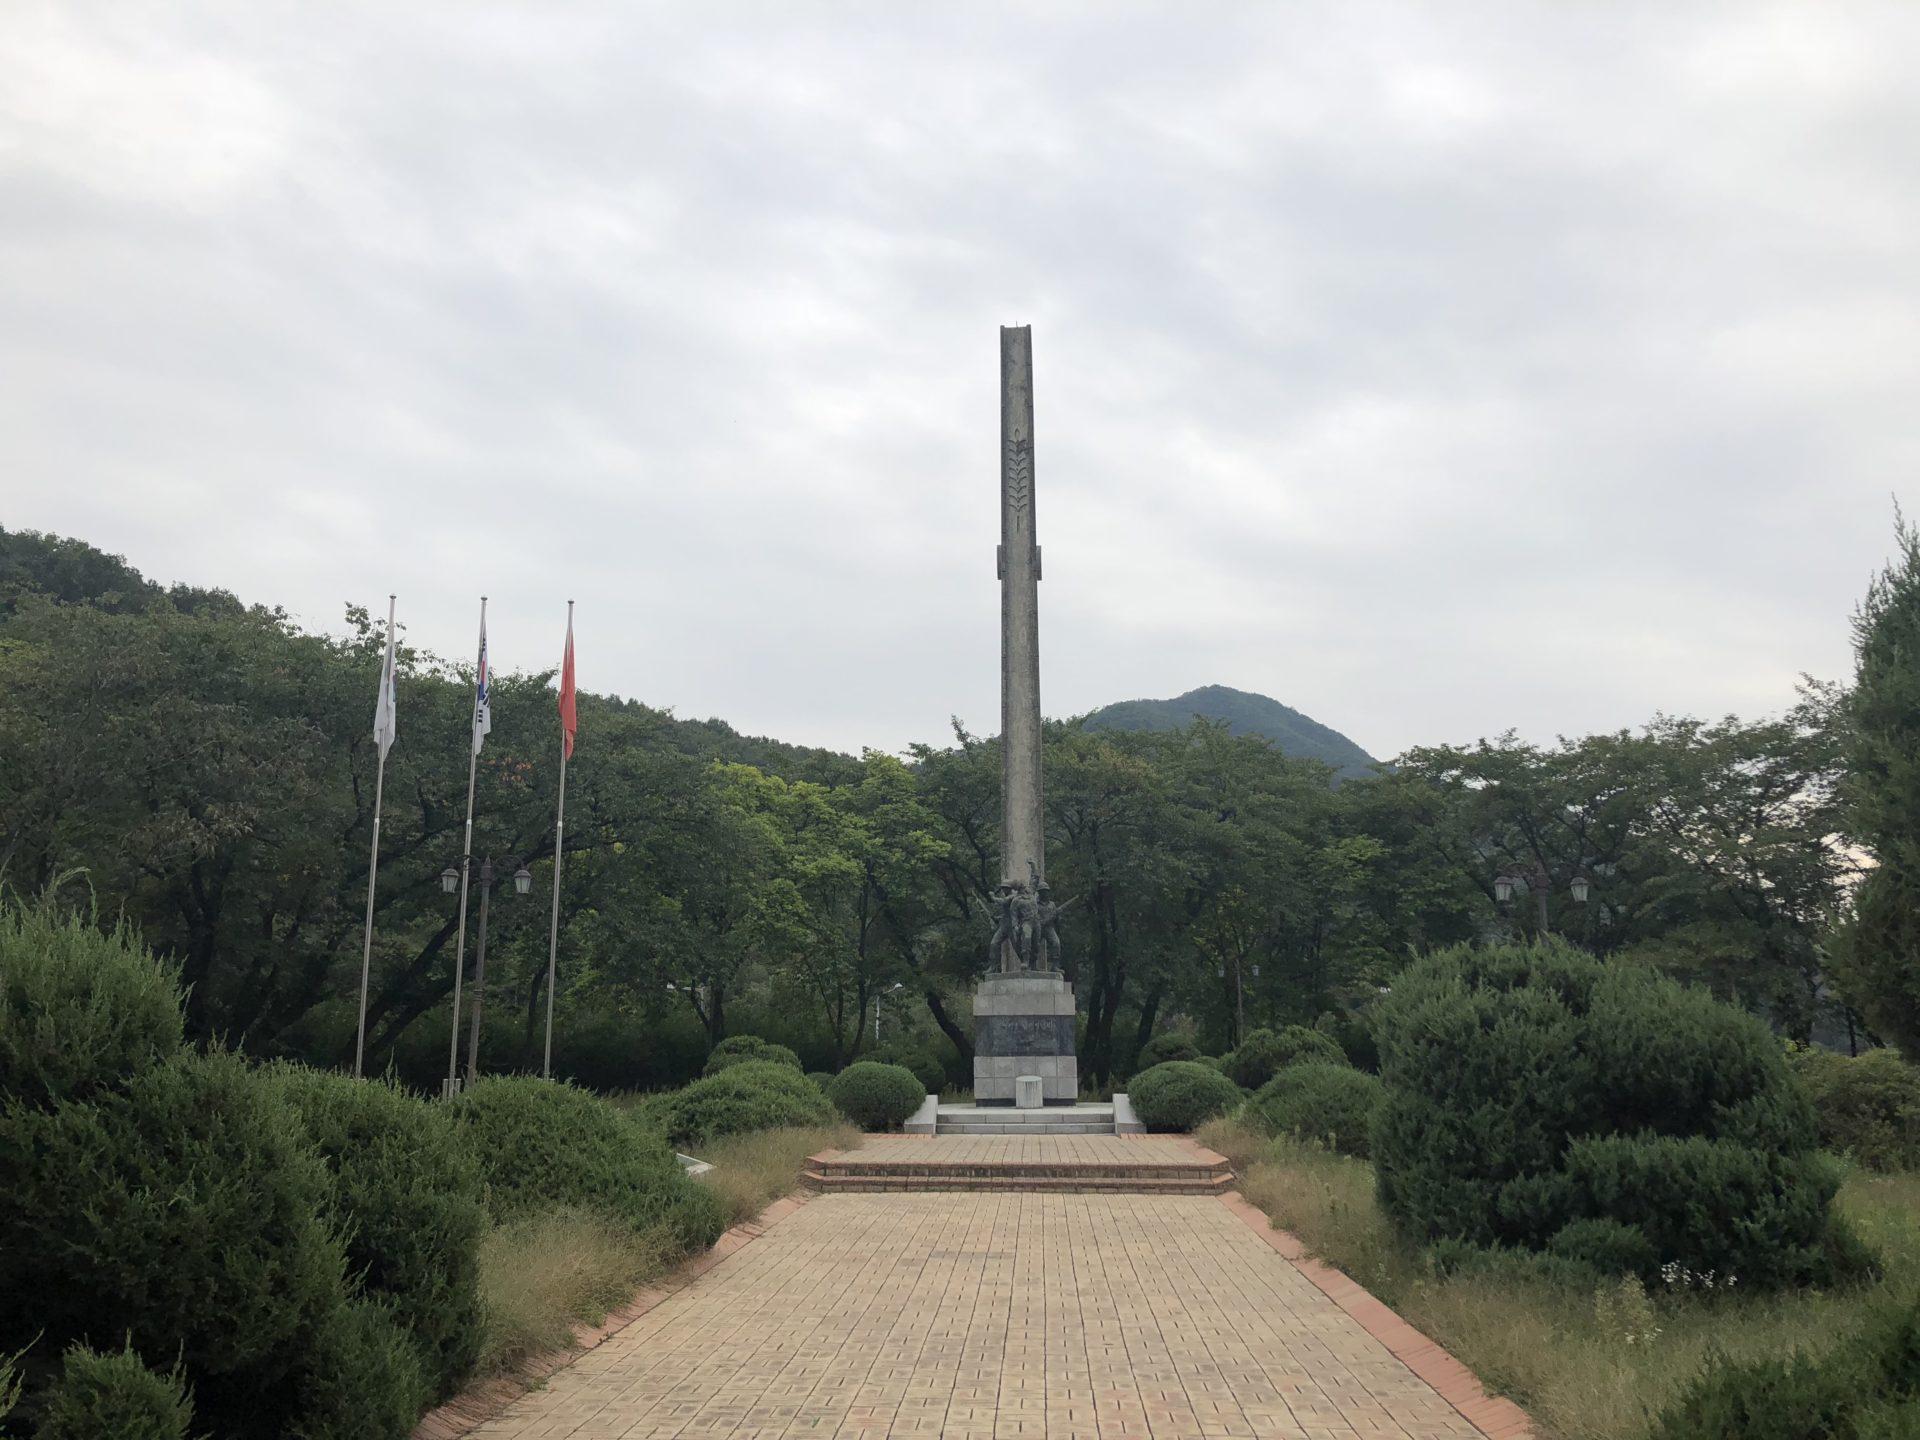 Korean War Memorials - 산16-1 Dongbaek-dong